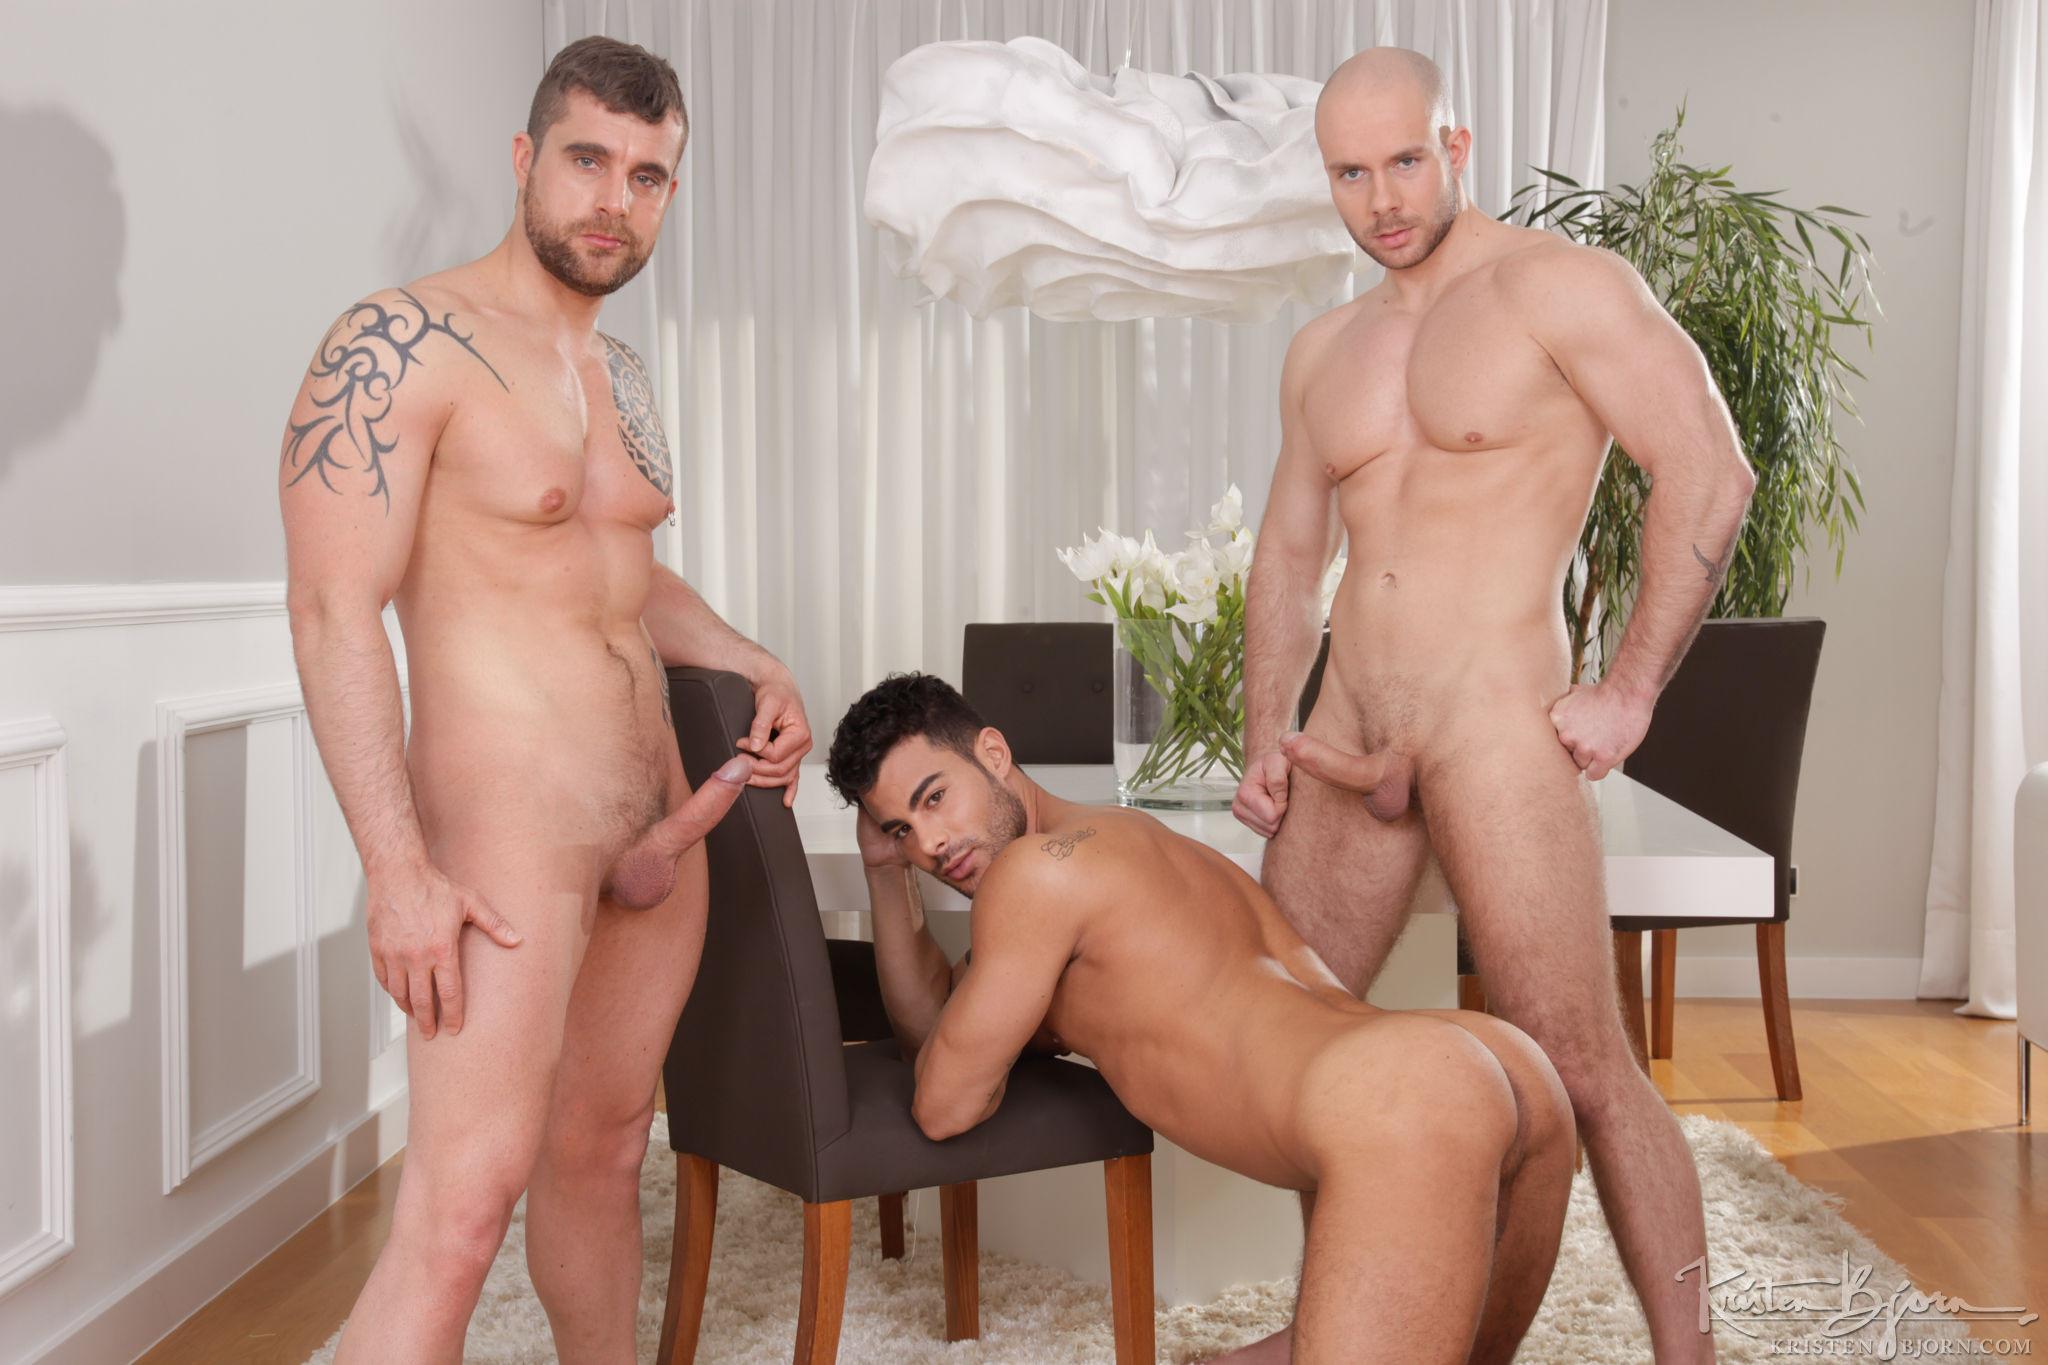 Skins: 3Some – Isaac Eliad, Jared, Marek Borek